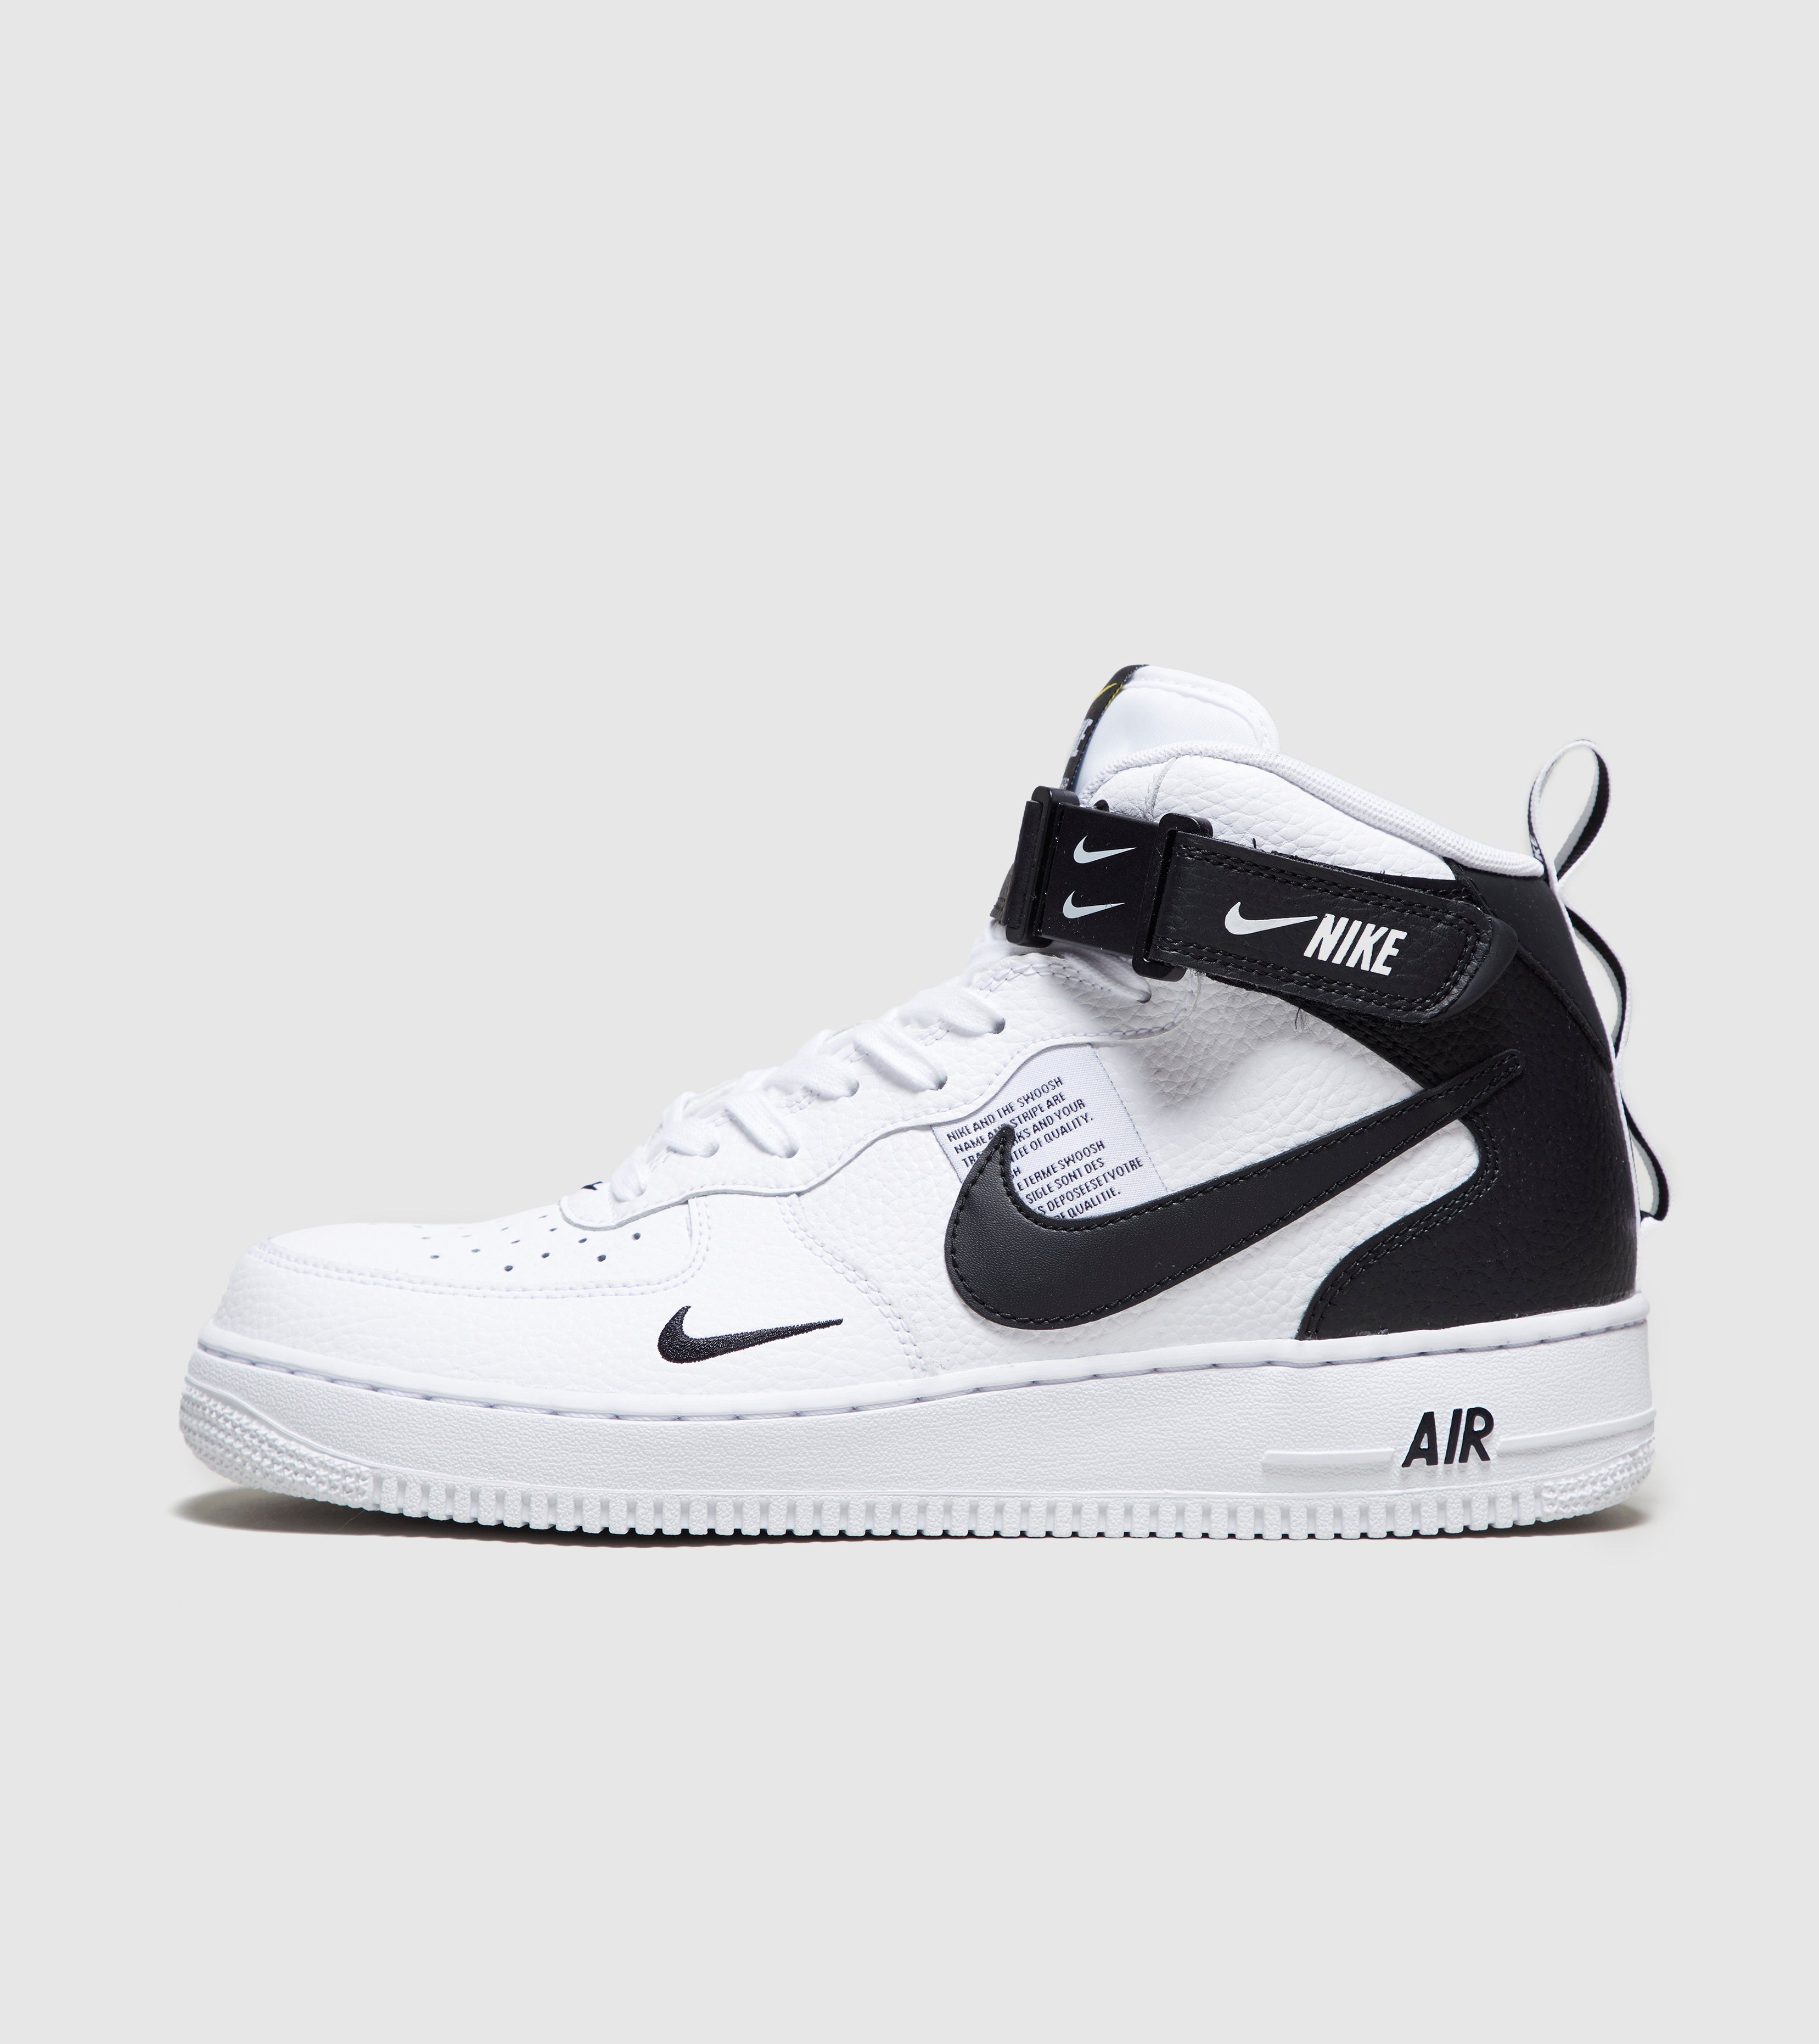 Nike Air Force 1 Utility Mid `07 LV8